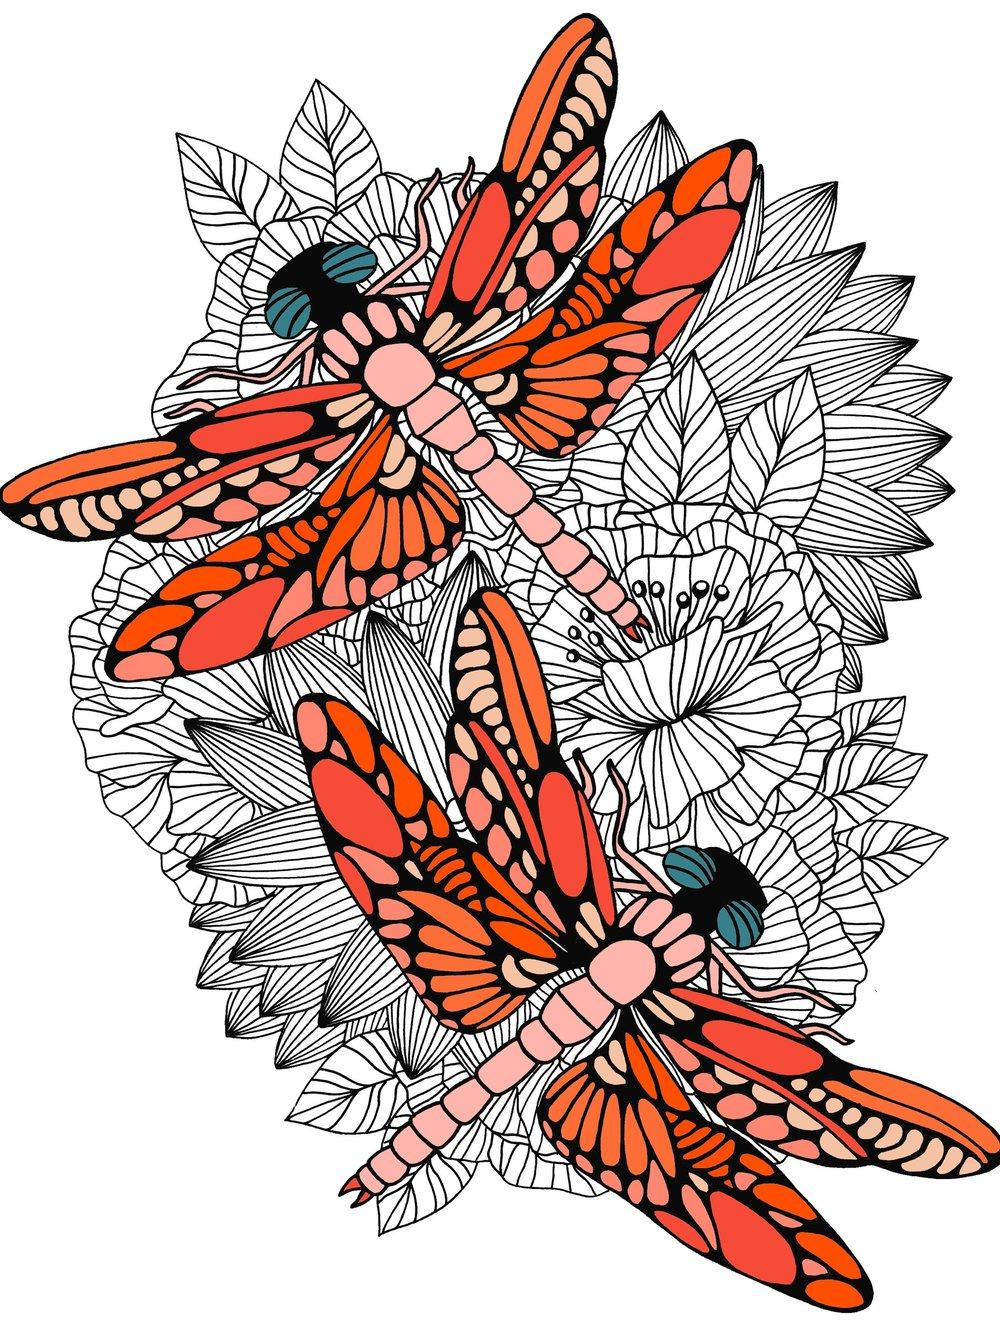 Dragonflies_Partial.jpg